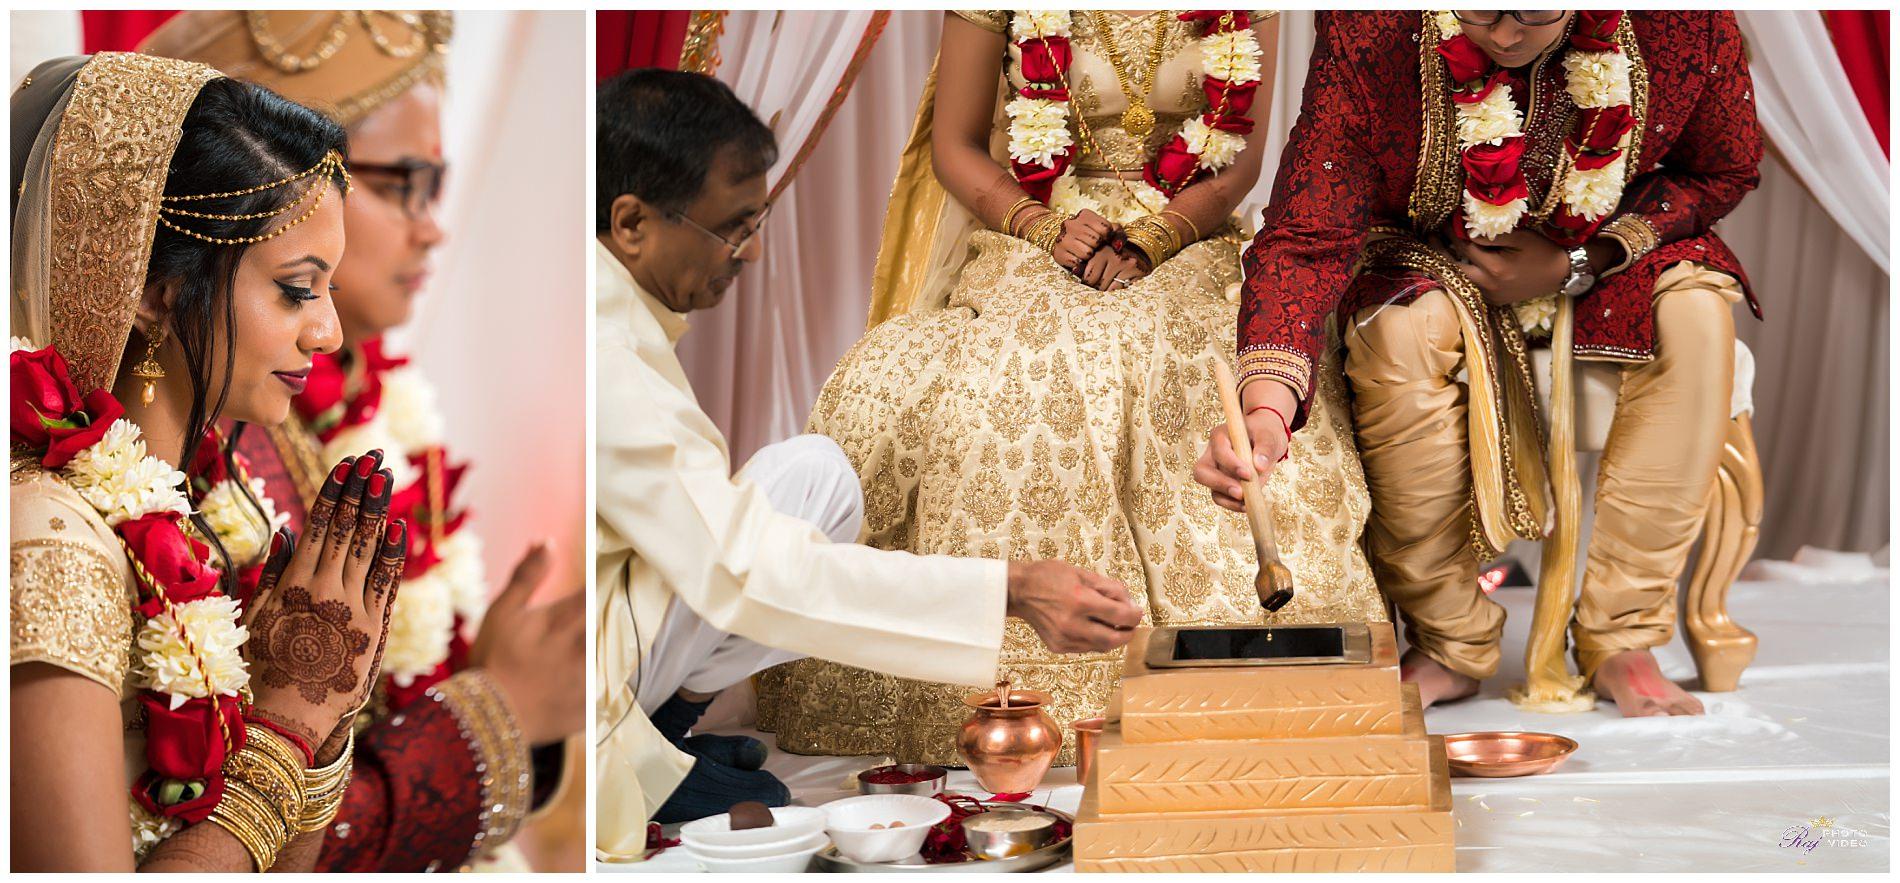 Aashirwad-Palace-Randolph-NJ-Hindu-Wedding-Ceremony-Khusbu-Jeff-15.jpg